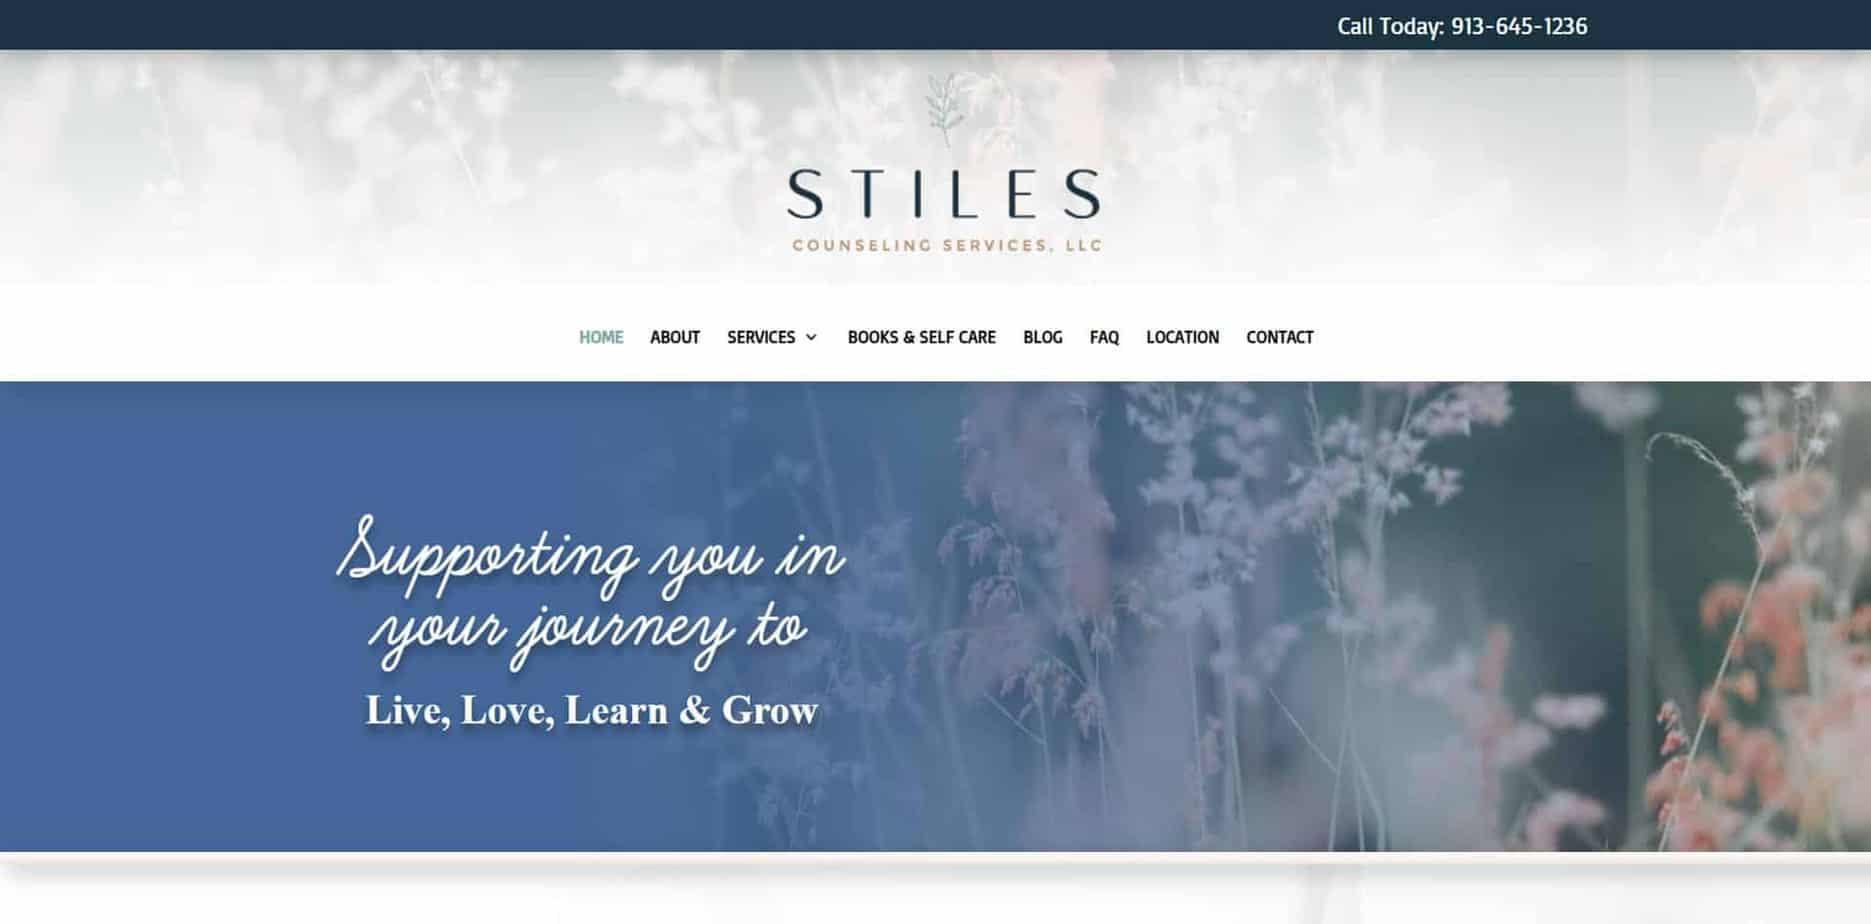 Stiles Counseling Services custom website design by MKS Web Design